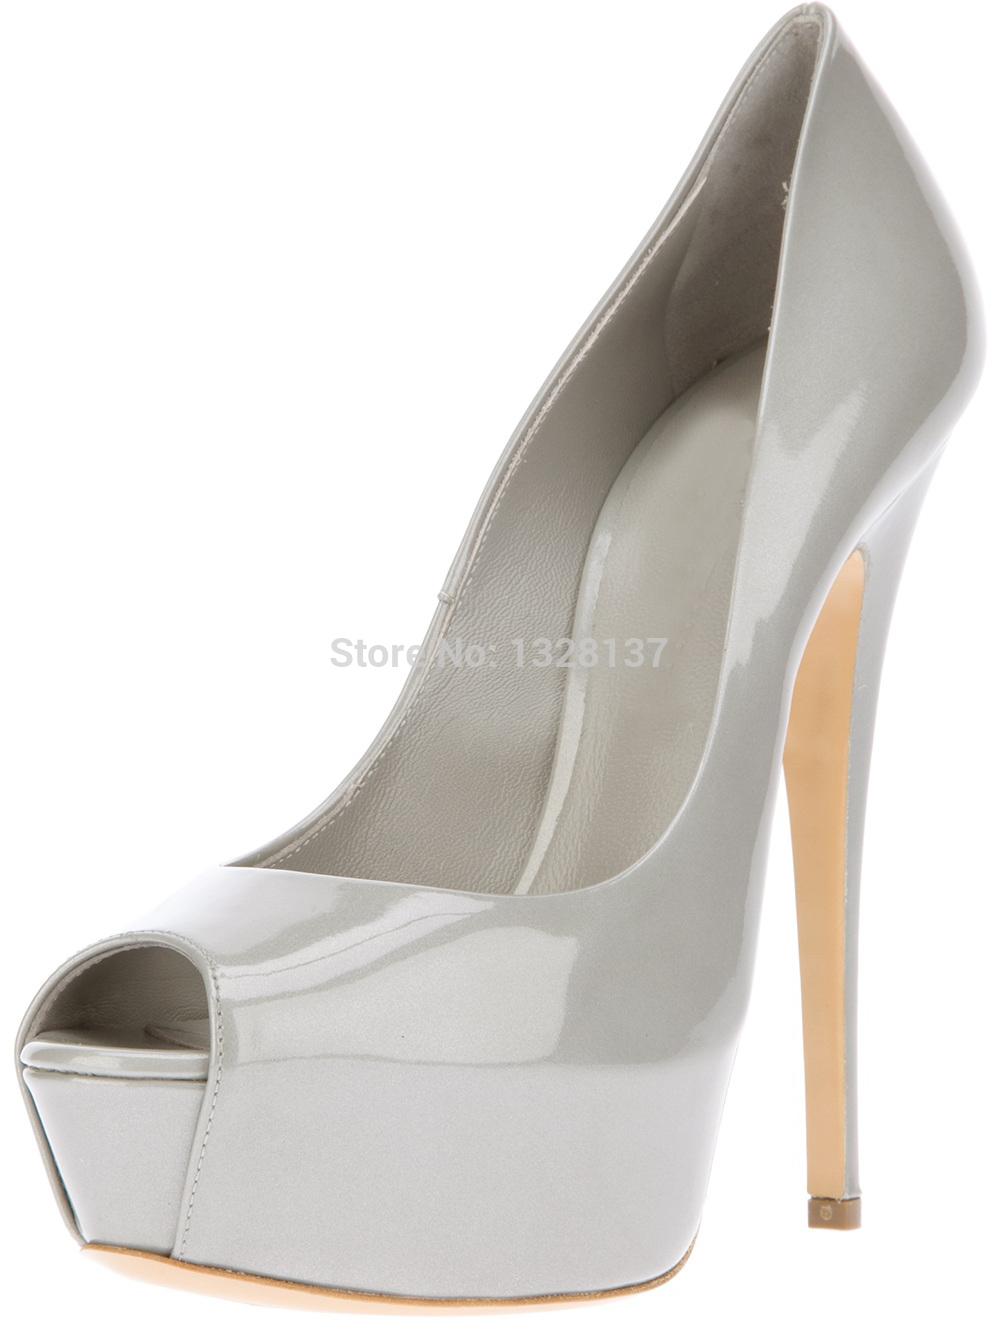 Shoes Woman Pumps Ankle Shoes Silver Heels Pumps Zapatos Peep Toe Pumps With Solid Platform Summer Platform Block Heel Pumps